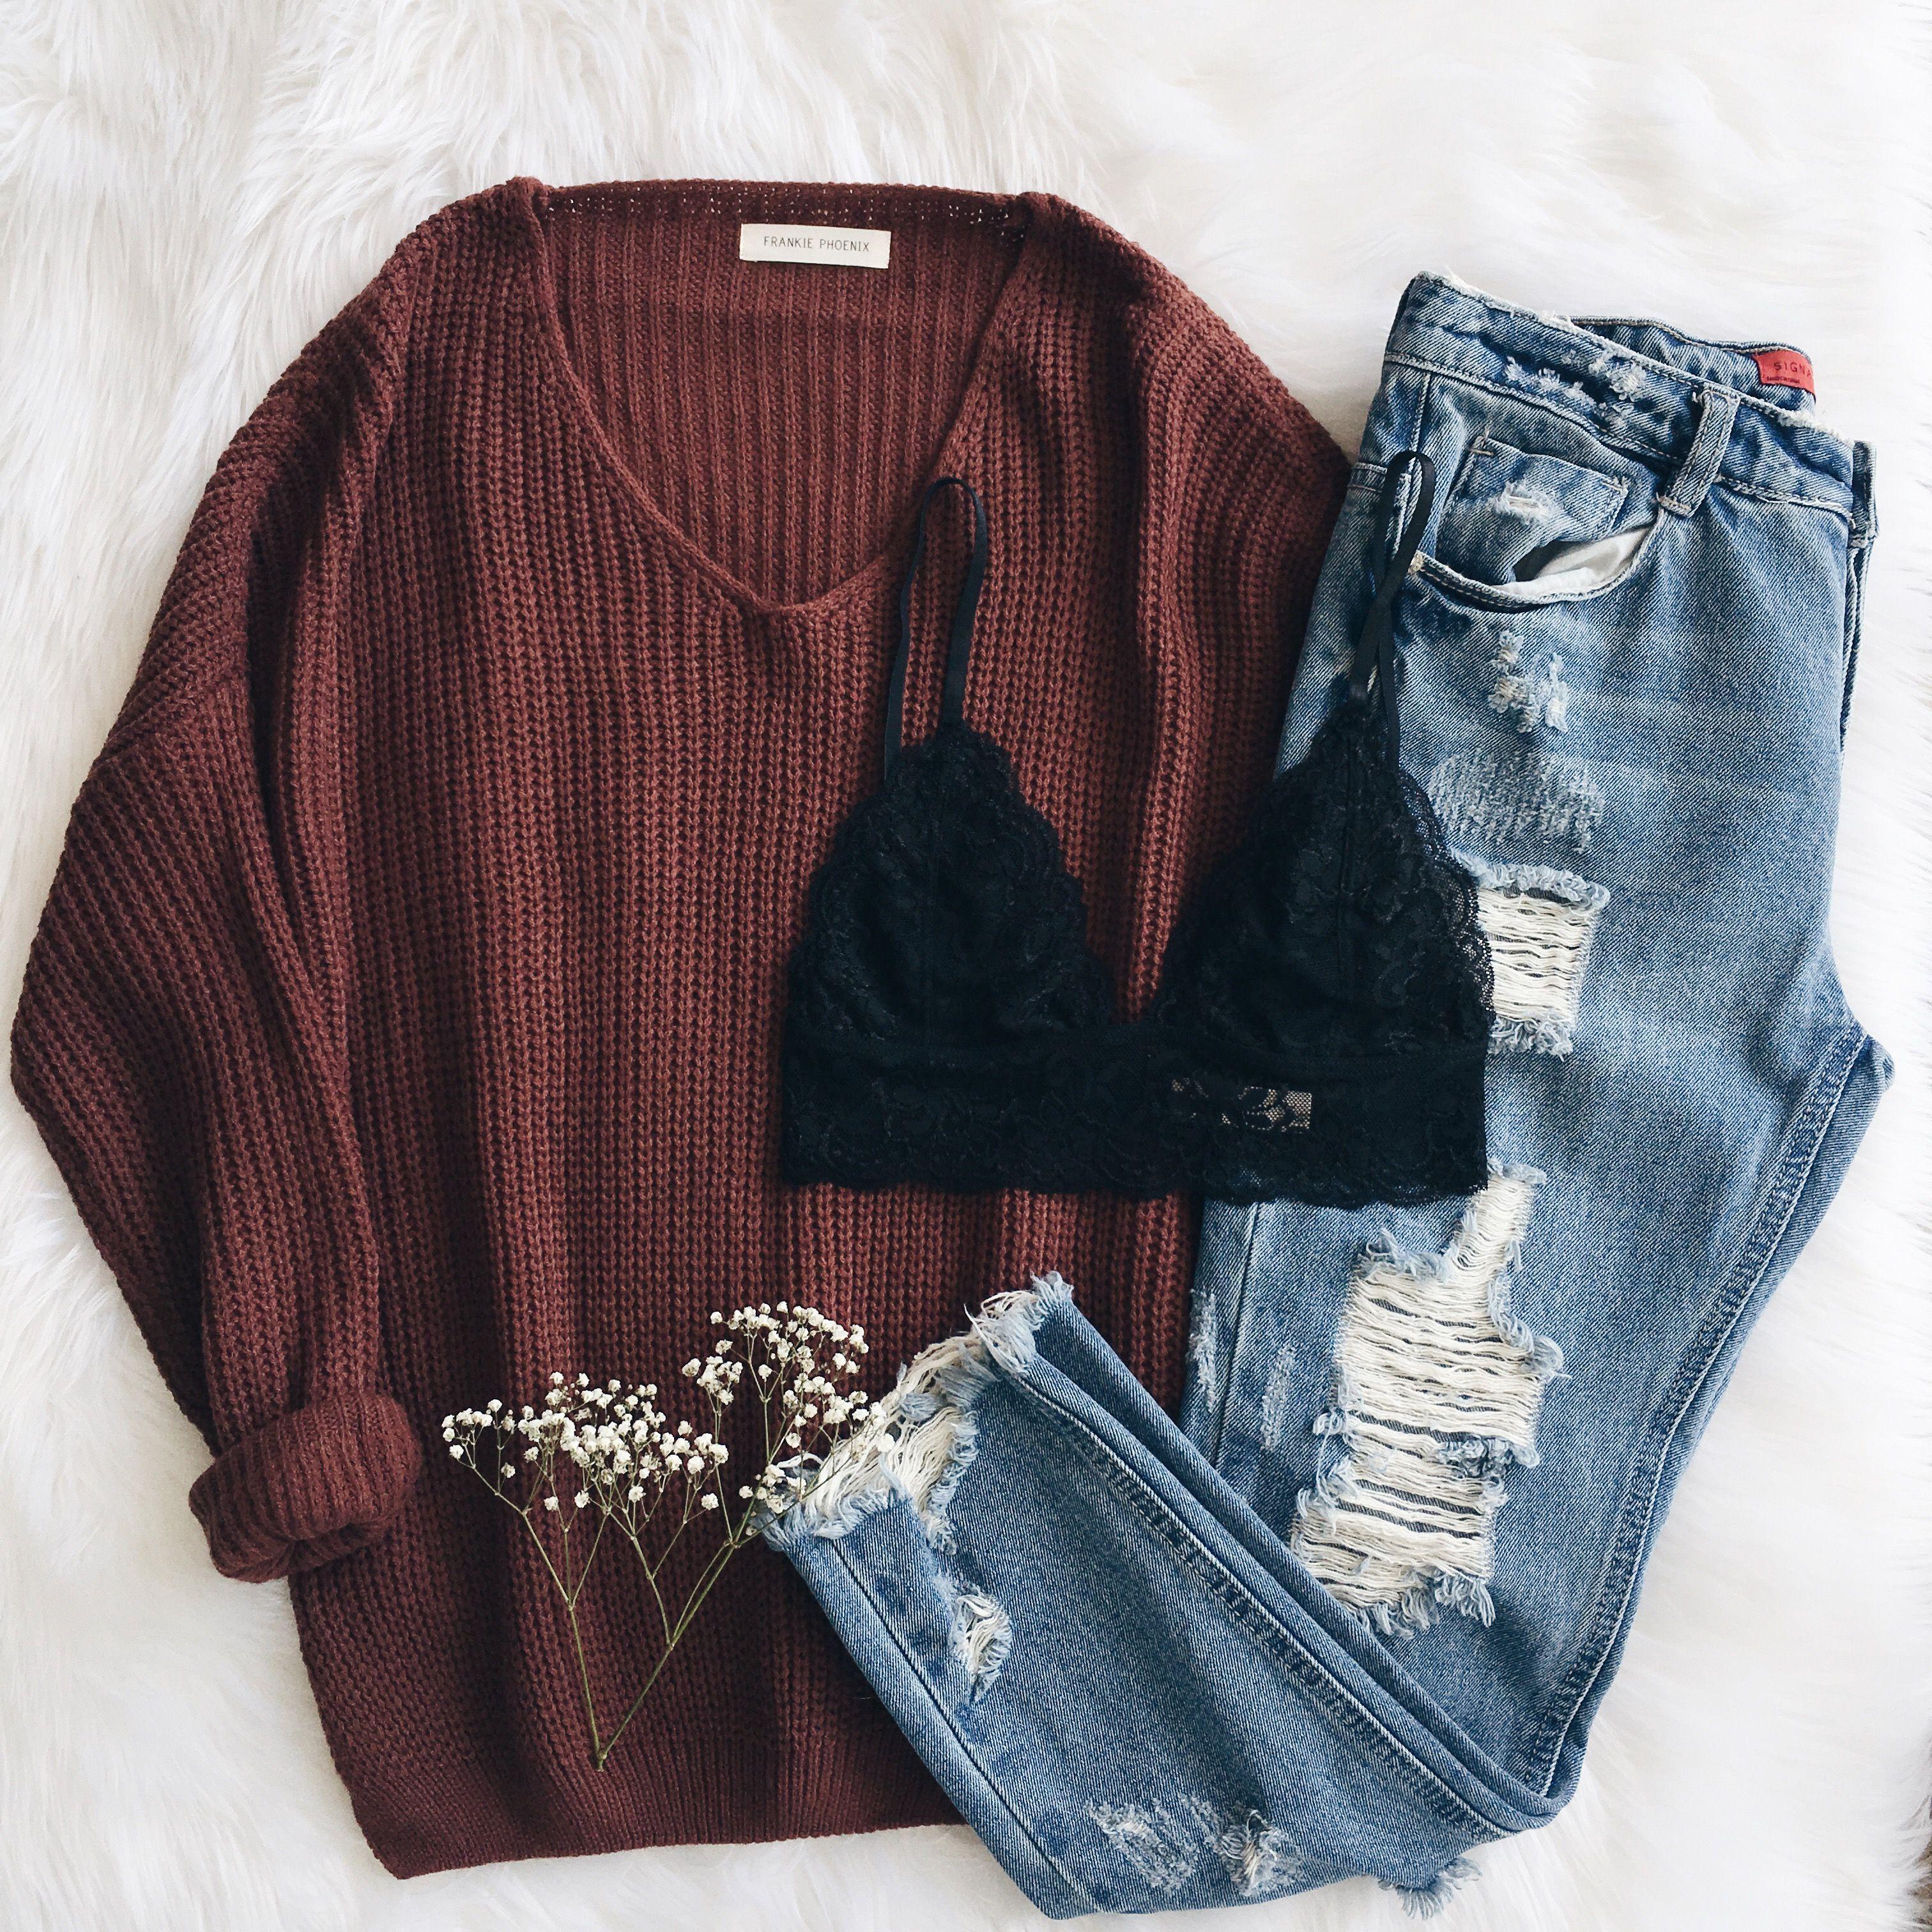 Pinterest xoannieyahnke outfits pinterest clothes